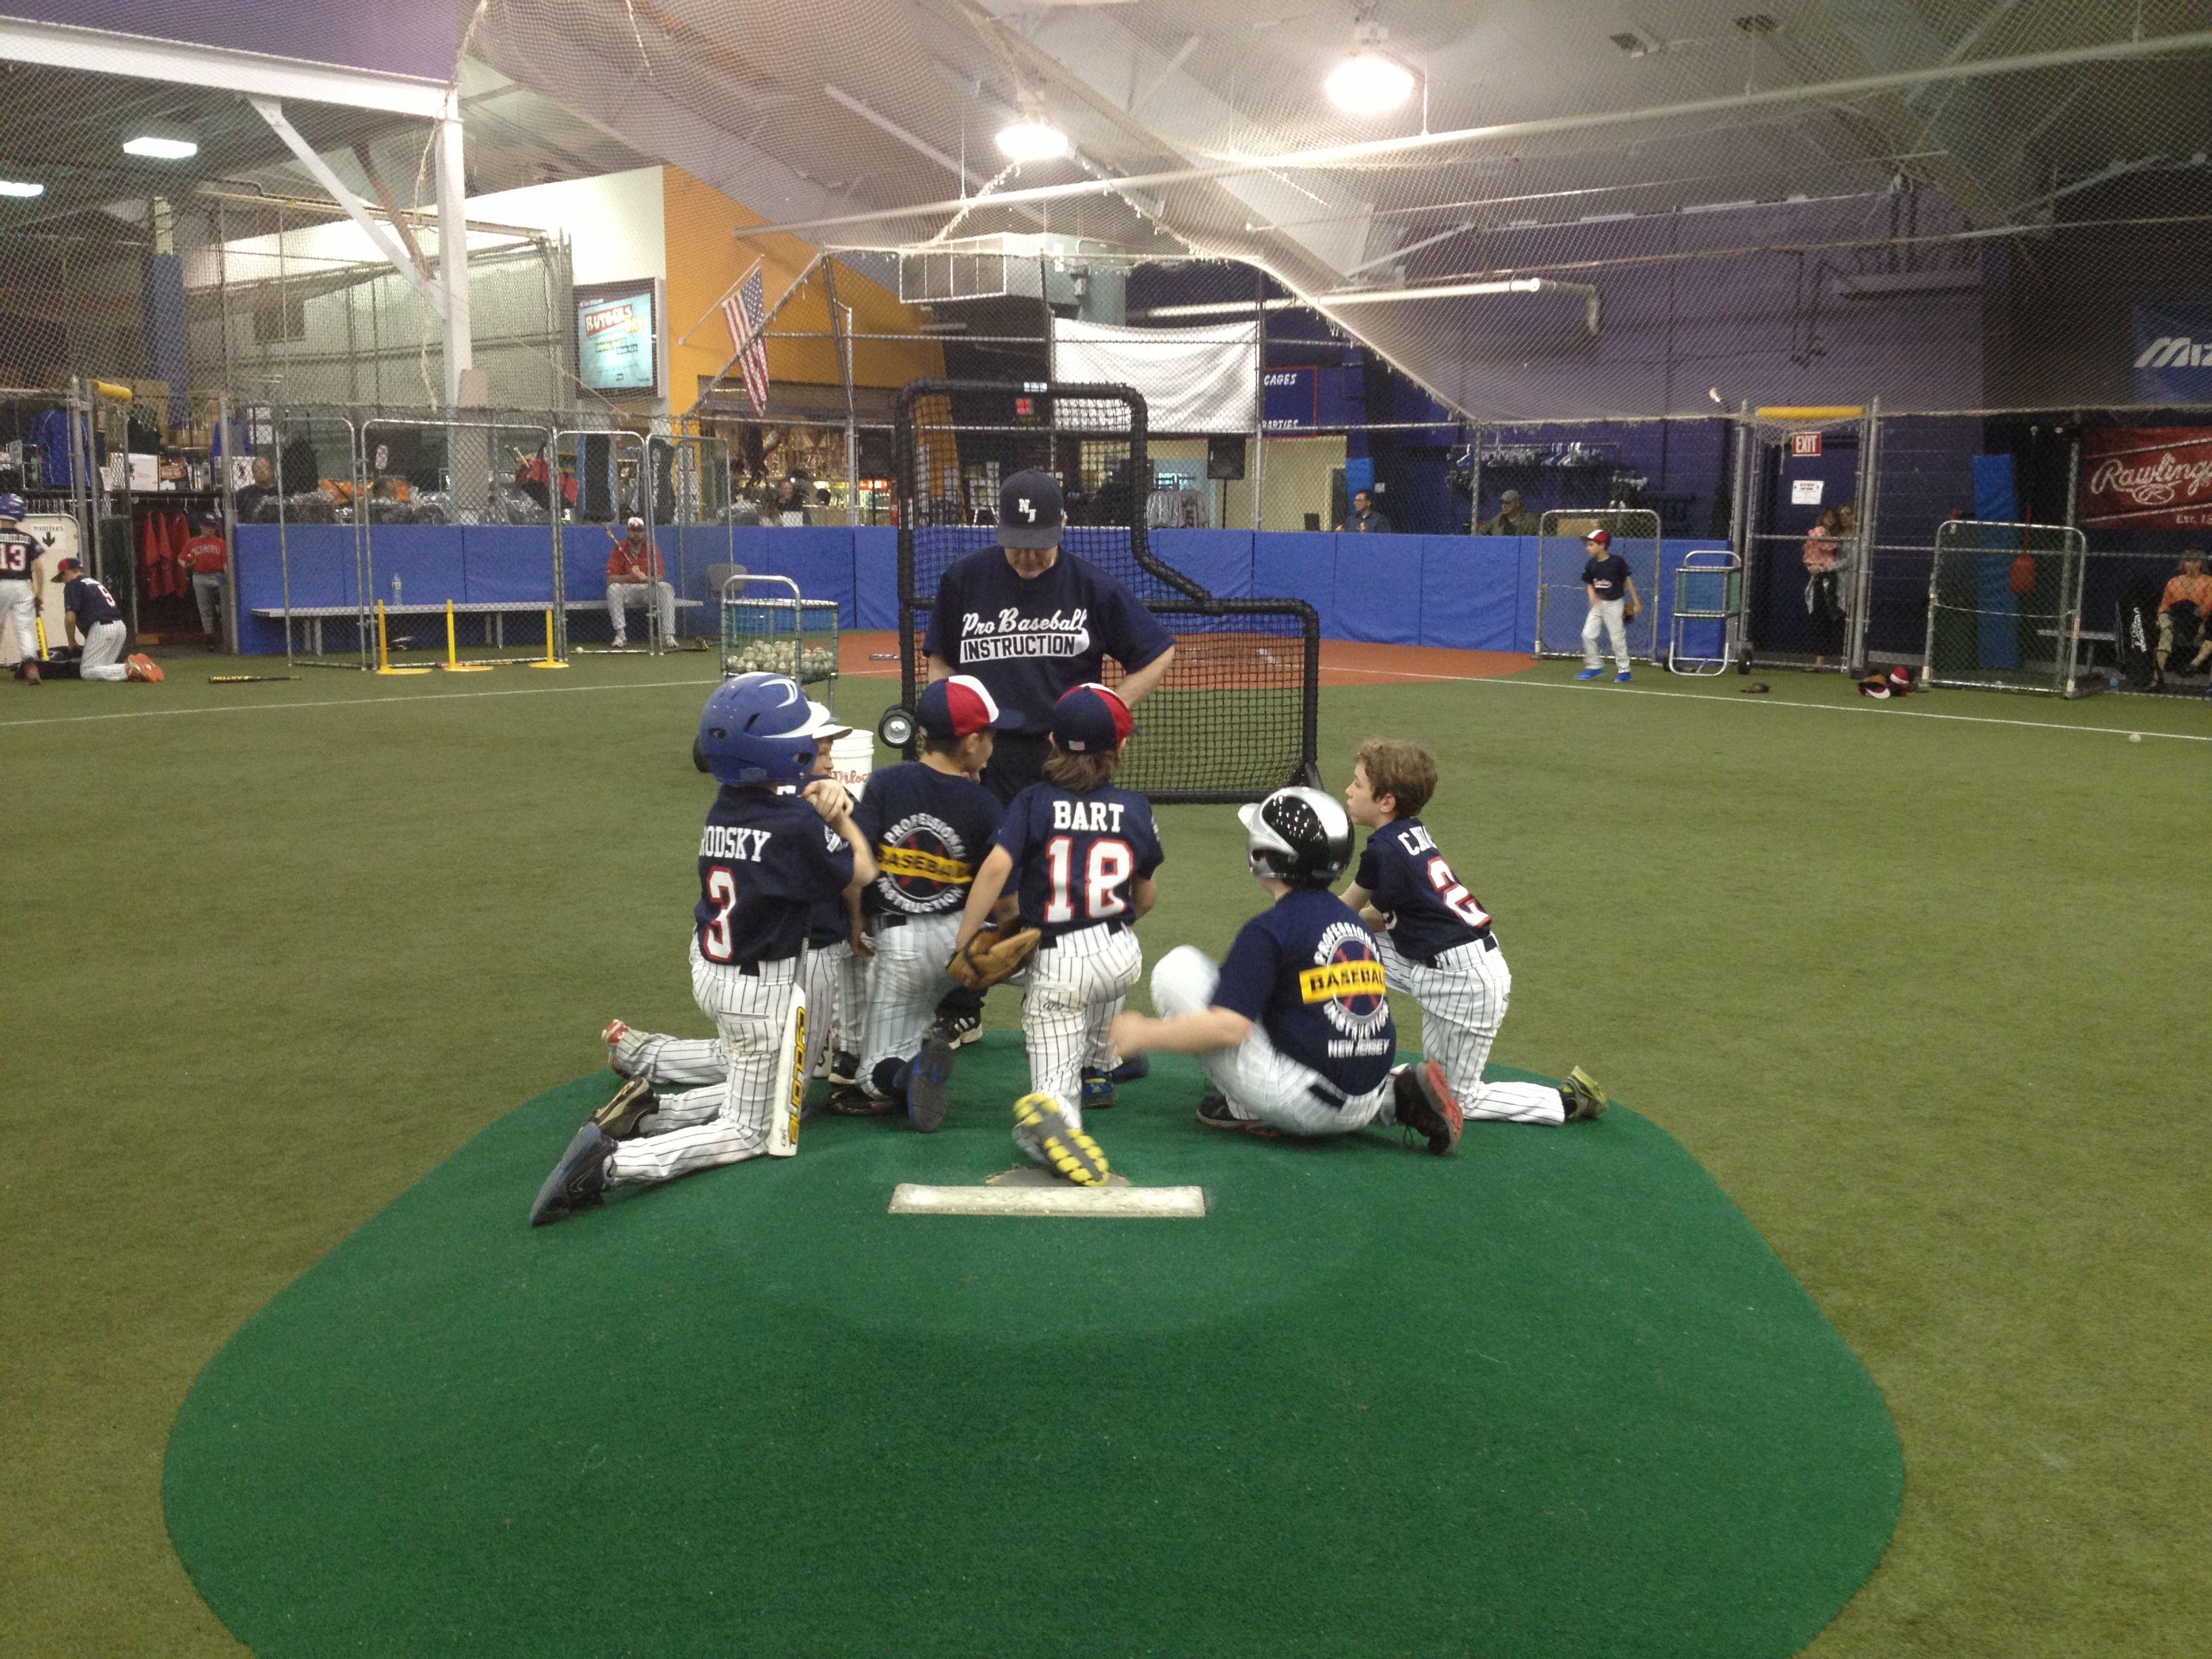 Eagles Baseball Association Is Proud To Announce 9u Eagle Ryan Homyak As One Of The Week 5 Eagle Players Of The Week R Baseball Program Baseball Soccer Field